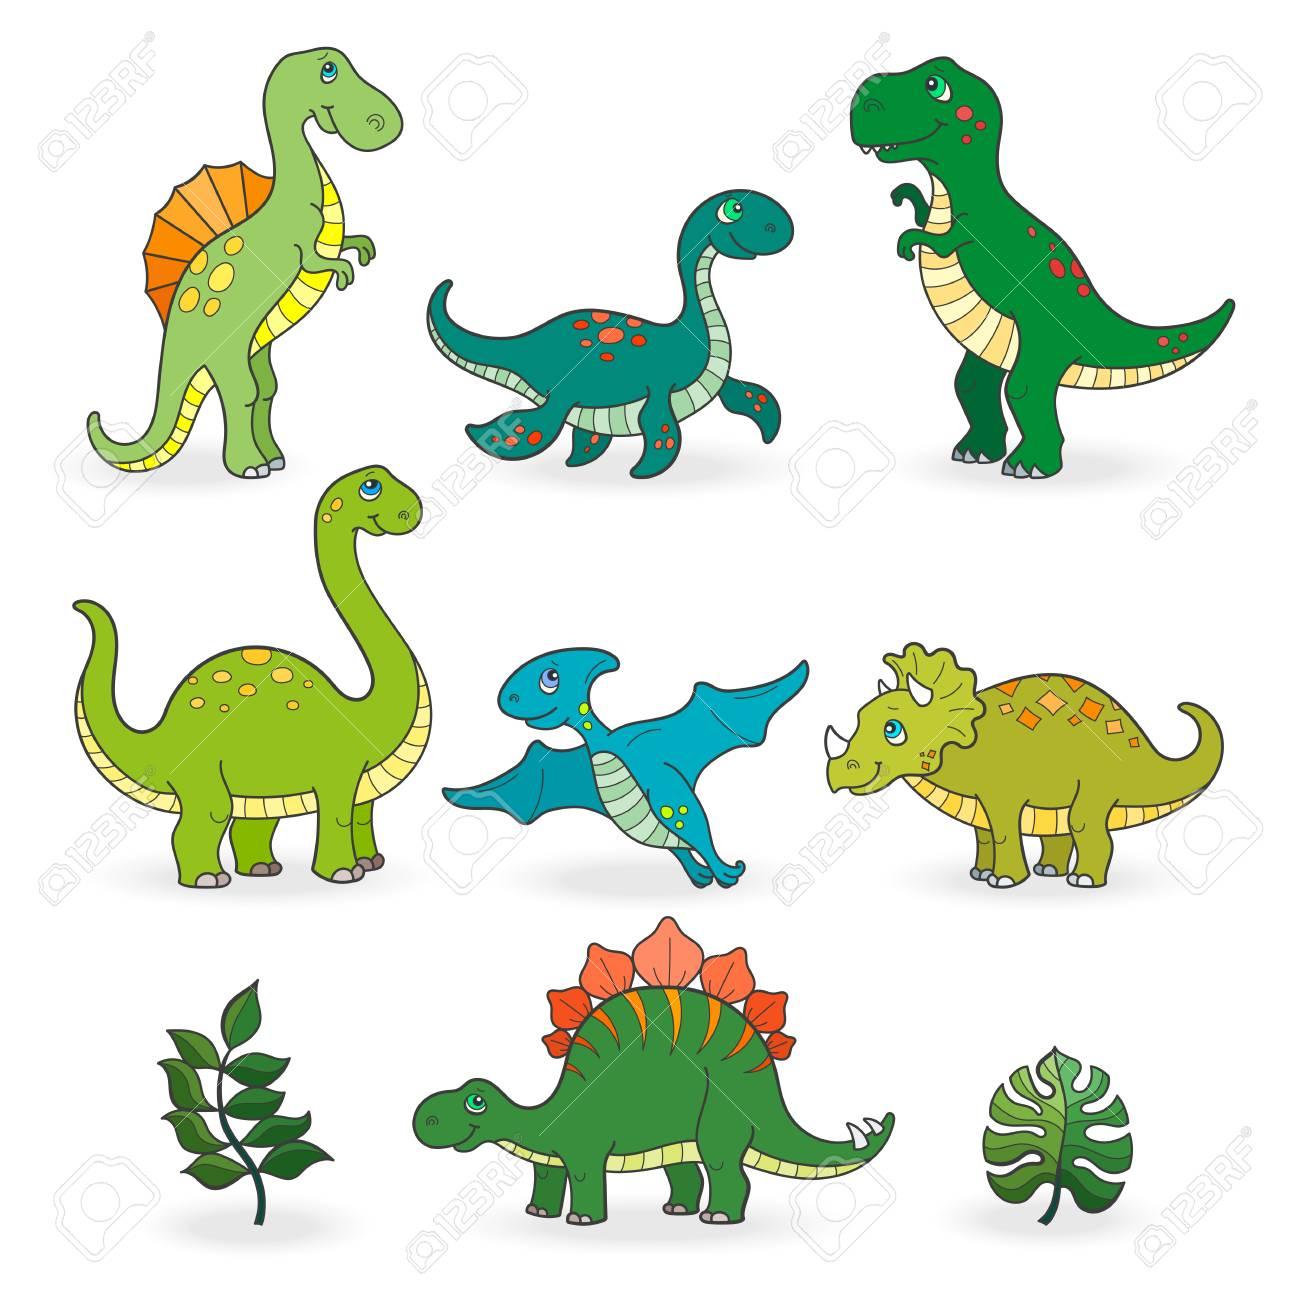 Set of funny cartoon dinosaurs isolated on white background - 97576053